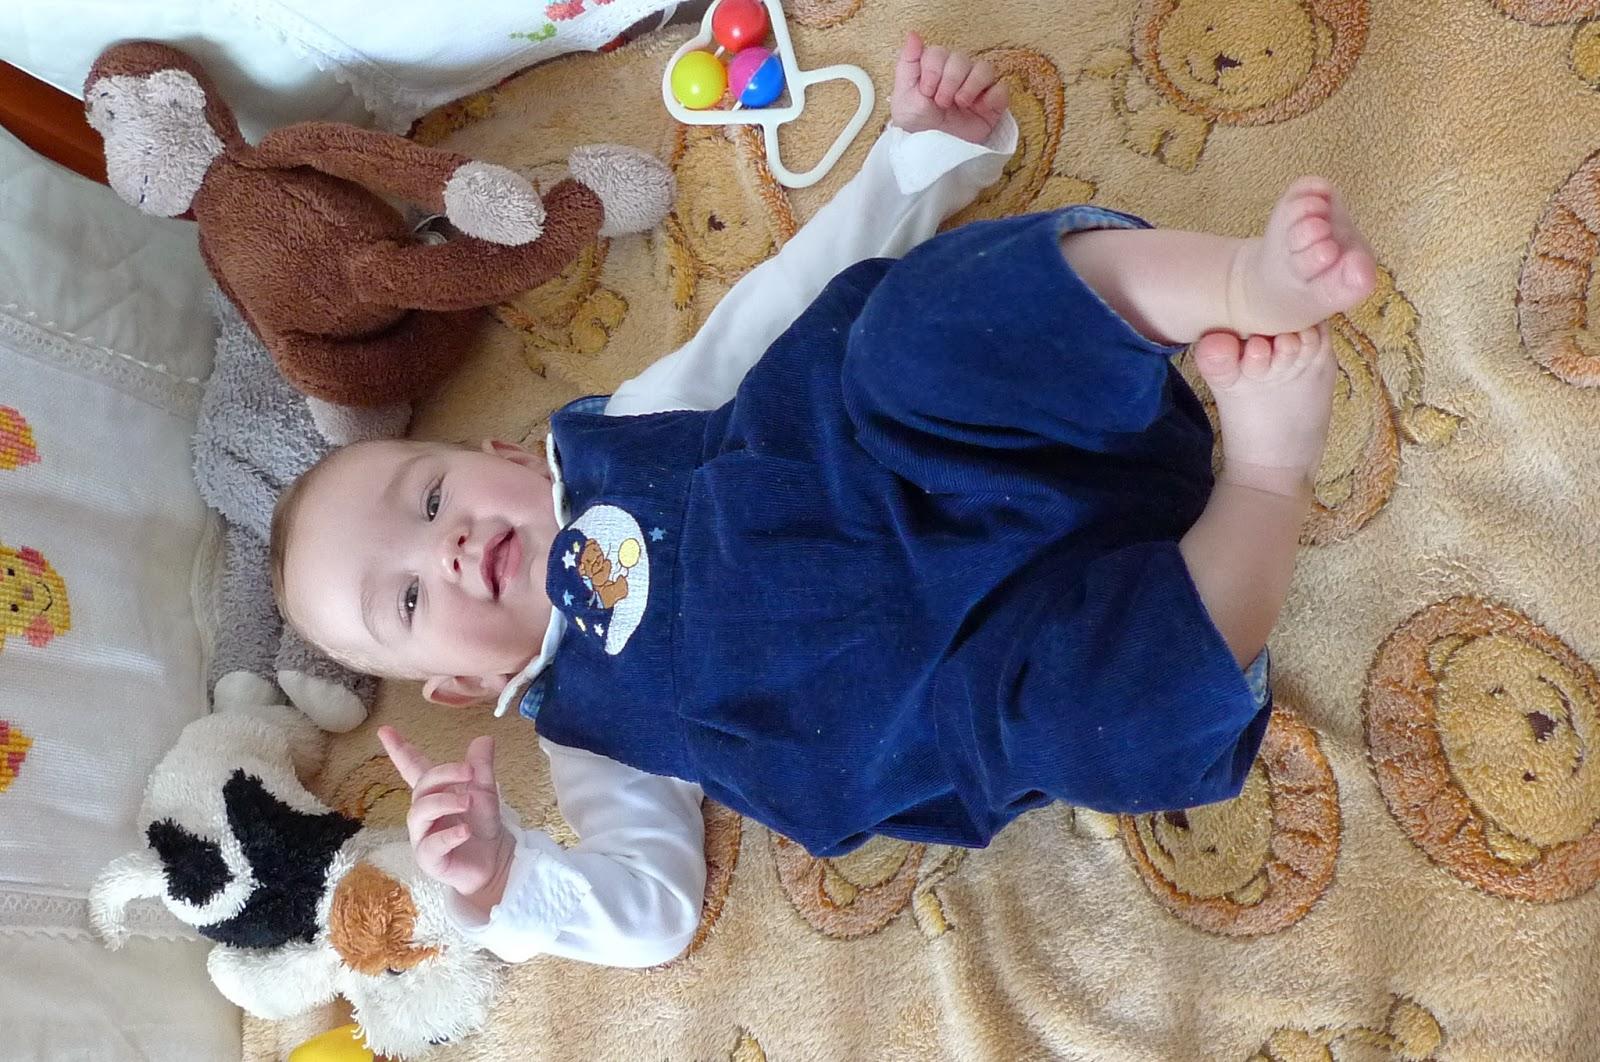 Mam już ponad 7 miesięcy!/I am 7 month old!